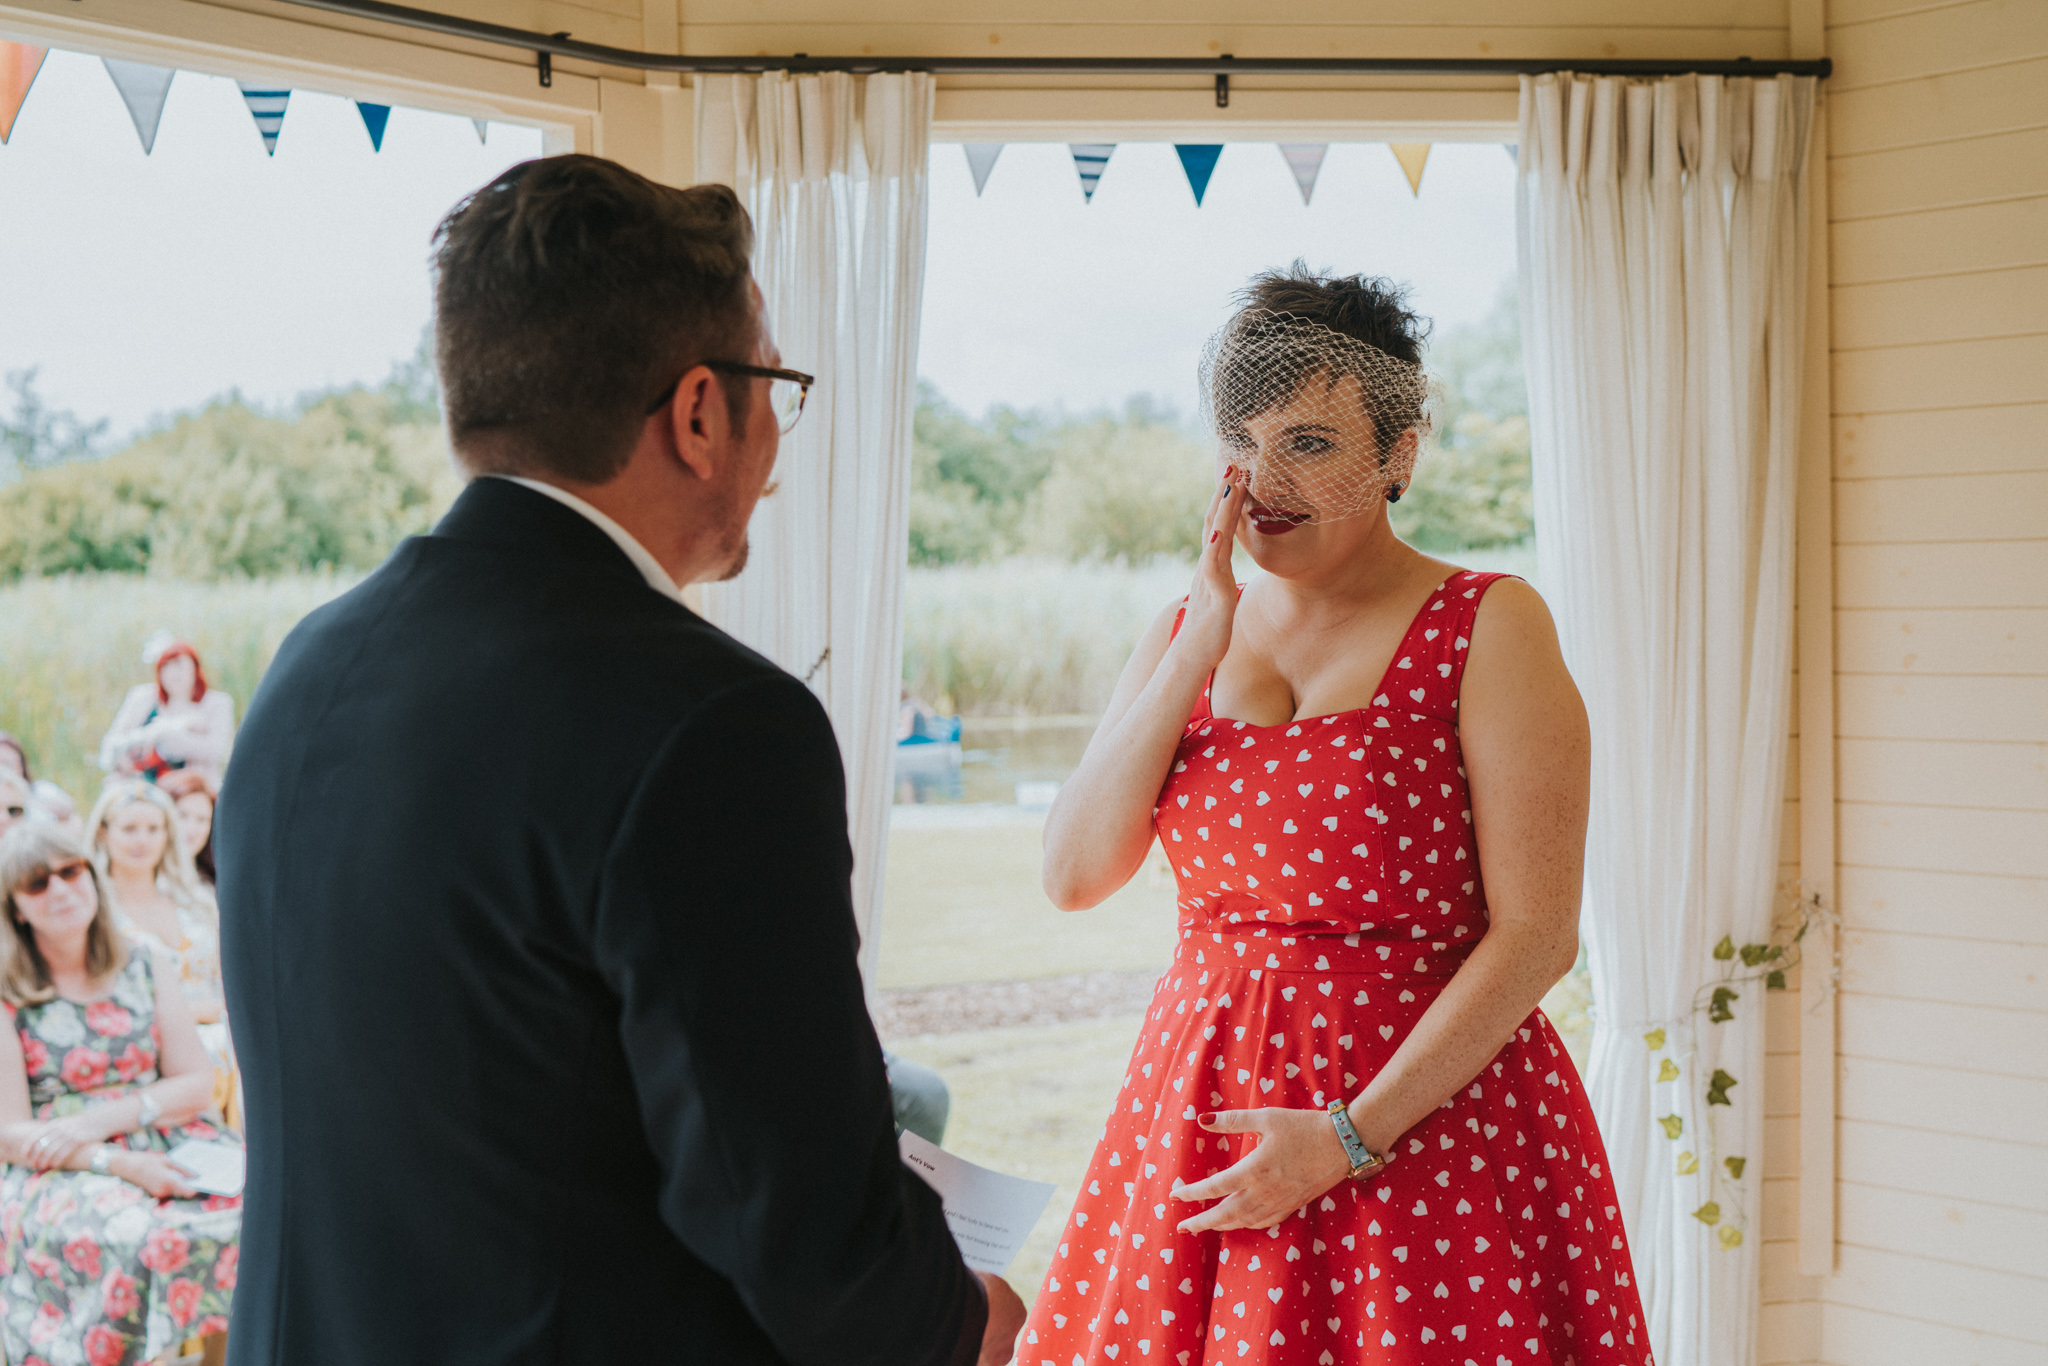 hannah-anthony-thorpeness-retro-diy-50s-wedding-grace-elizabeth-colchester-essex-alternative-wedding-lifestyle-photographer-essex-suffolk-norfolk-devon (12 of 39).jpg